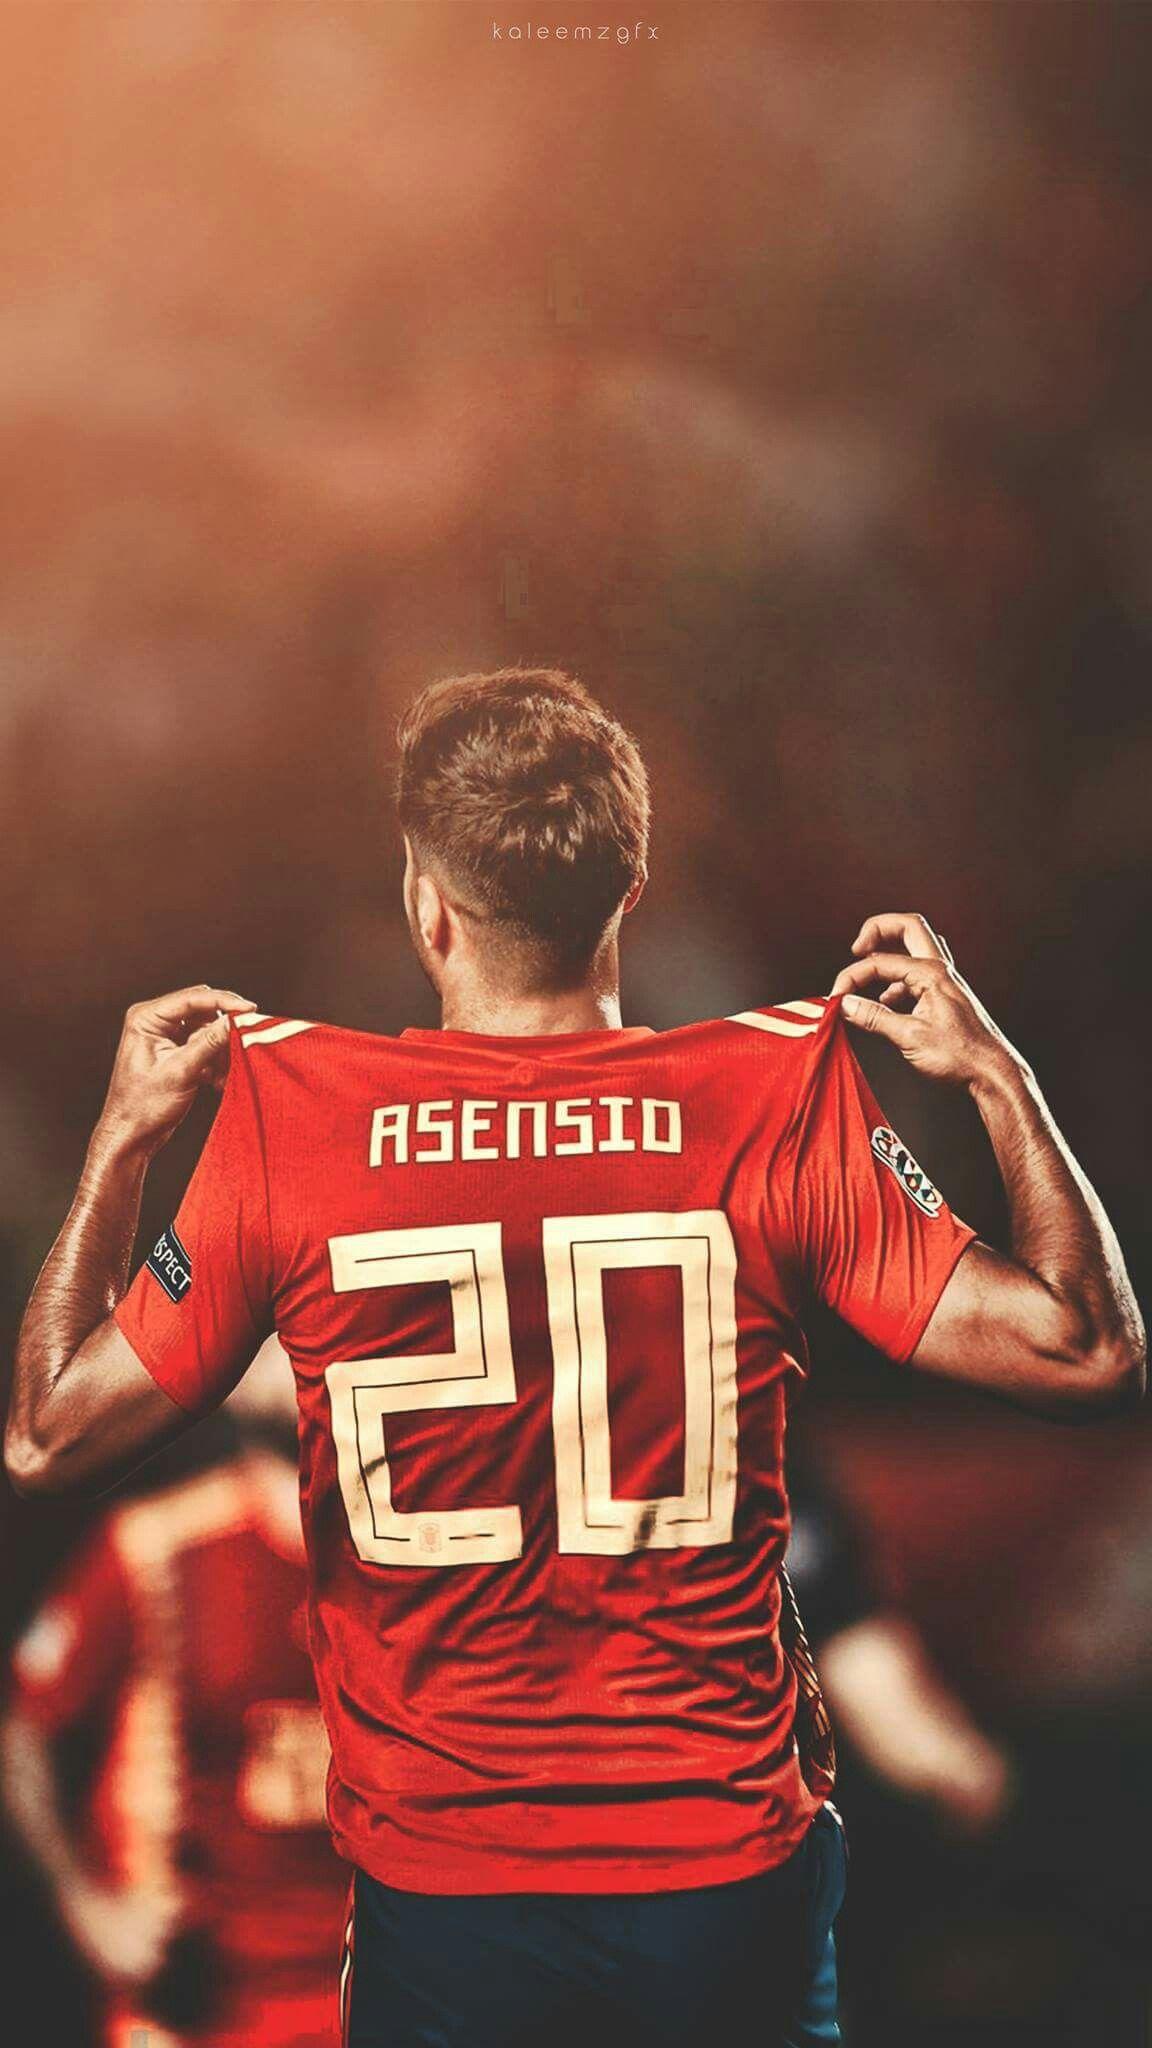 Marco Asensio Asensio Marco Asensio Jugador De Futbol